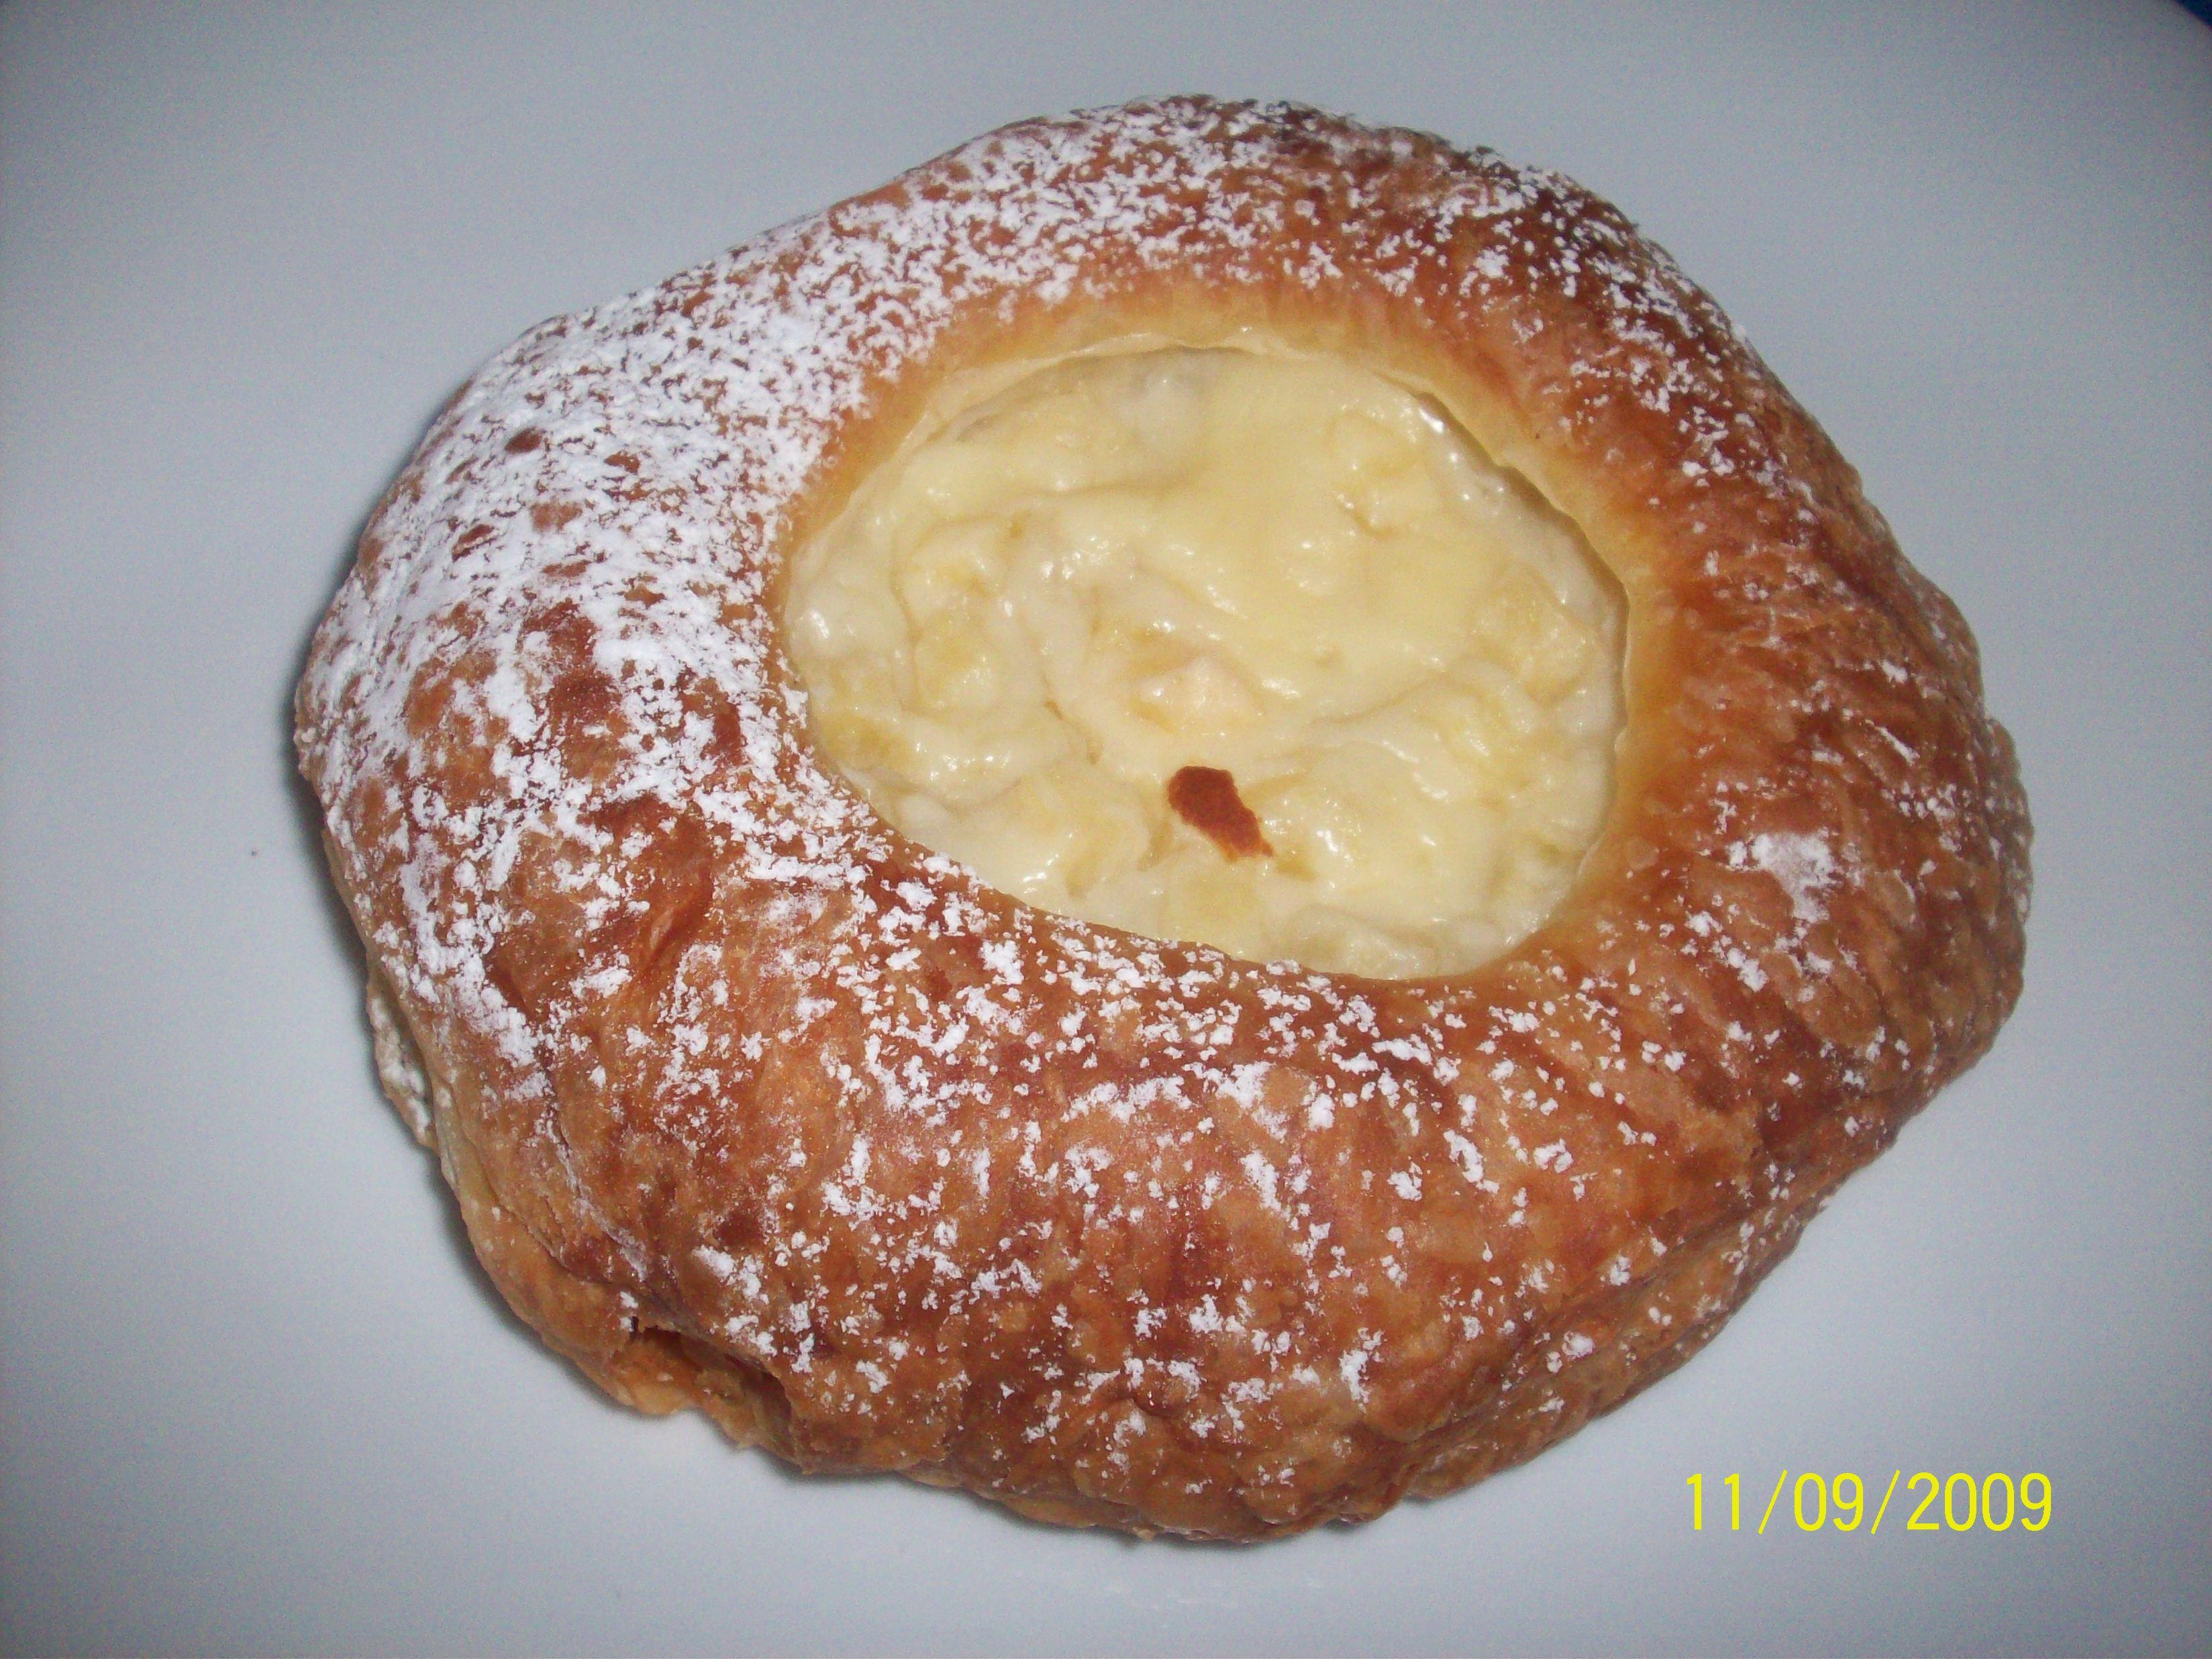 https://foodloader.net/cutie_2009-09-11_Cobs_Bread2.jpg